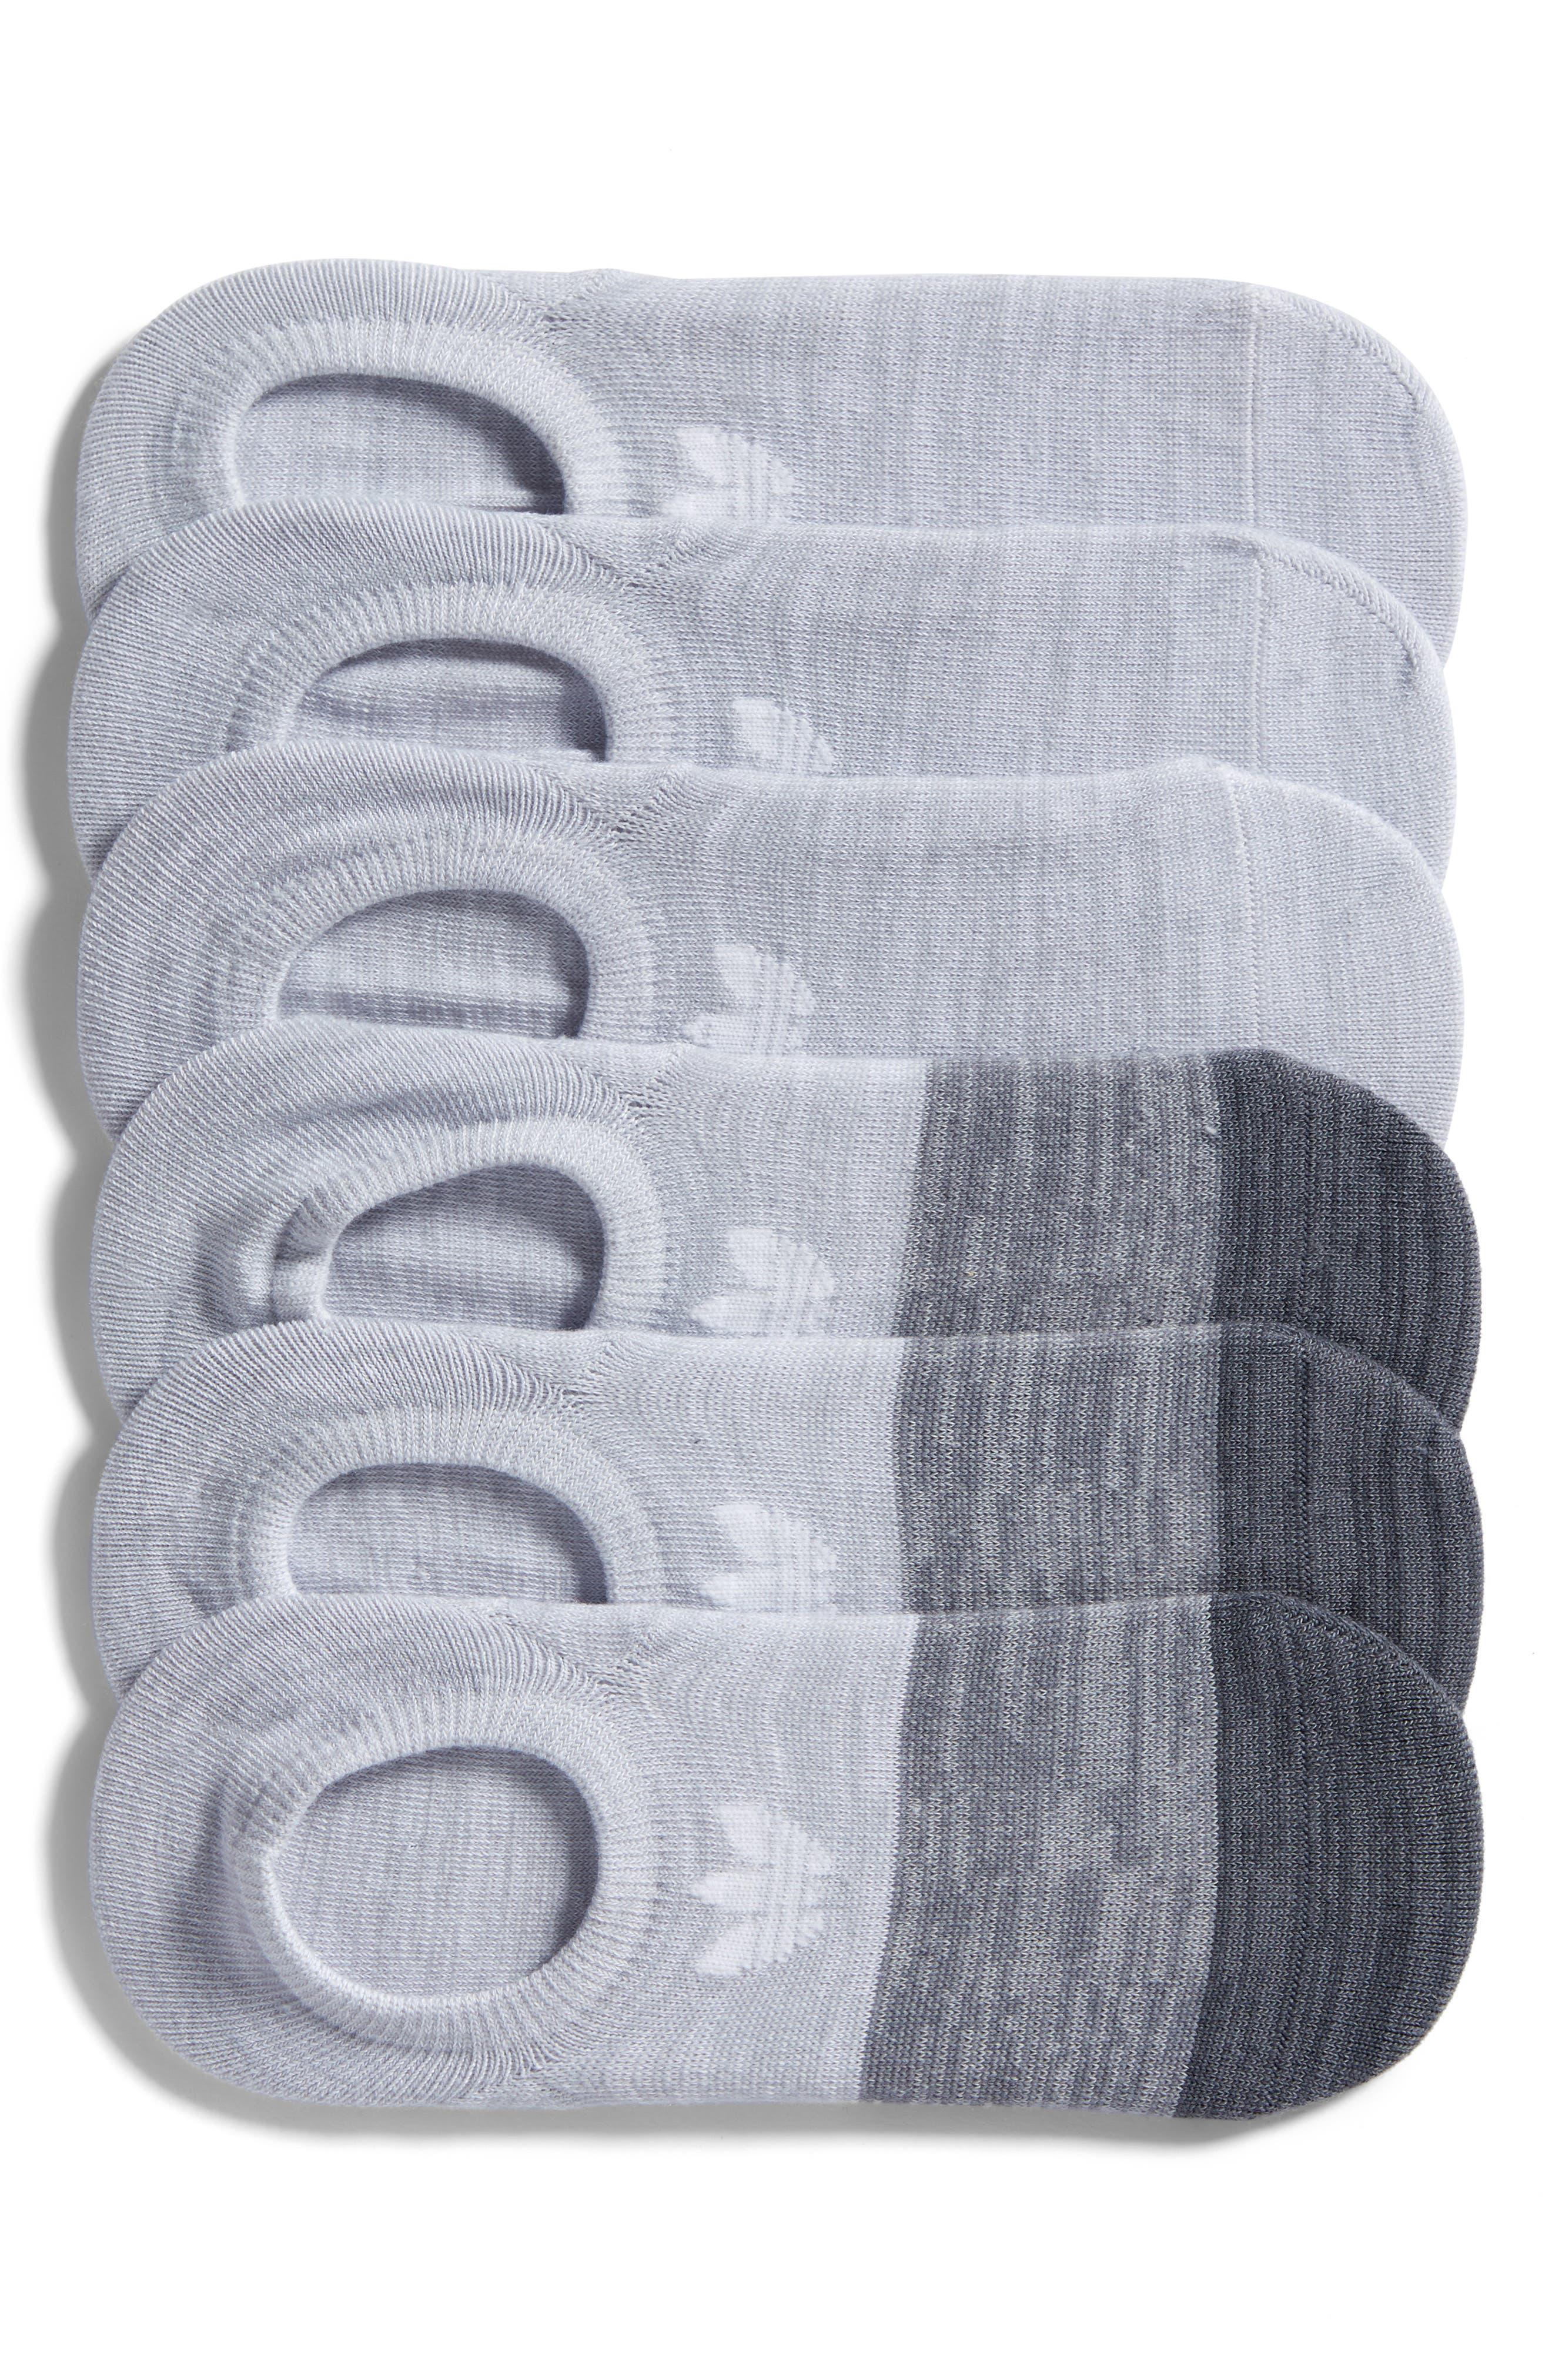 Block Space Dye 6-Pack Super No-Show Socks,                         Main,                         color, 020